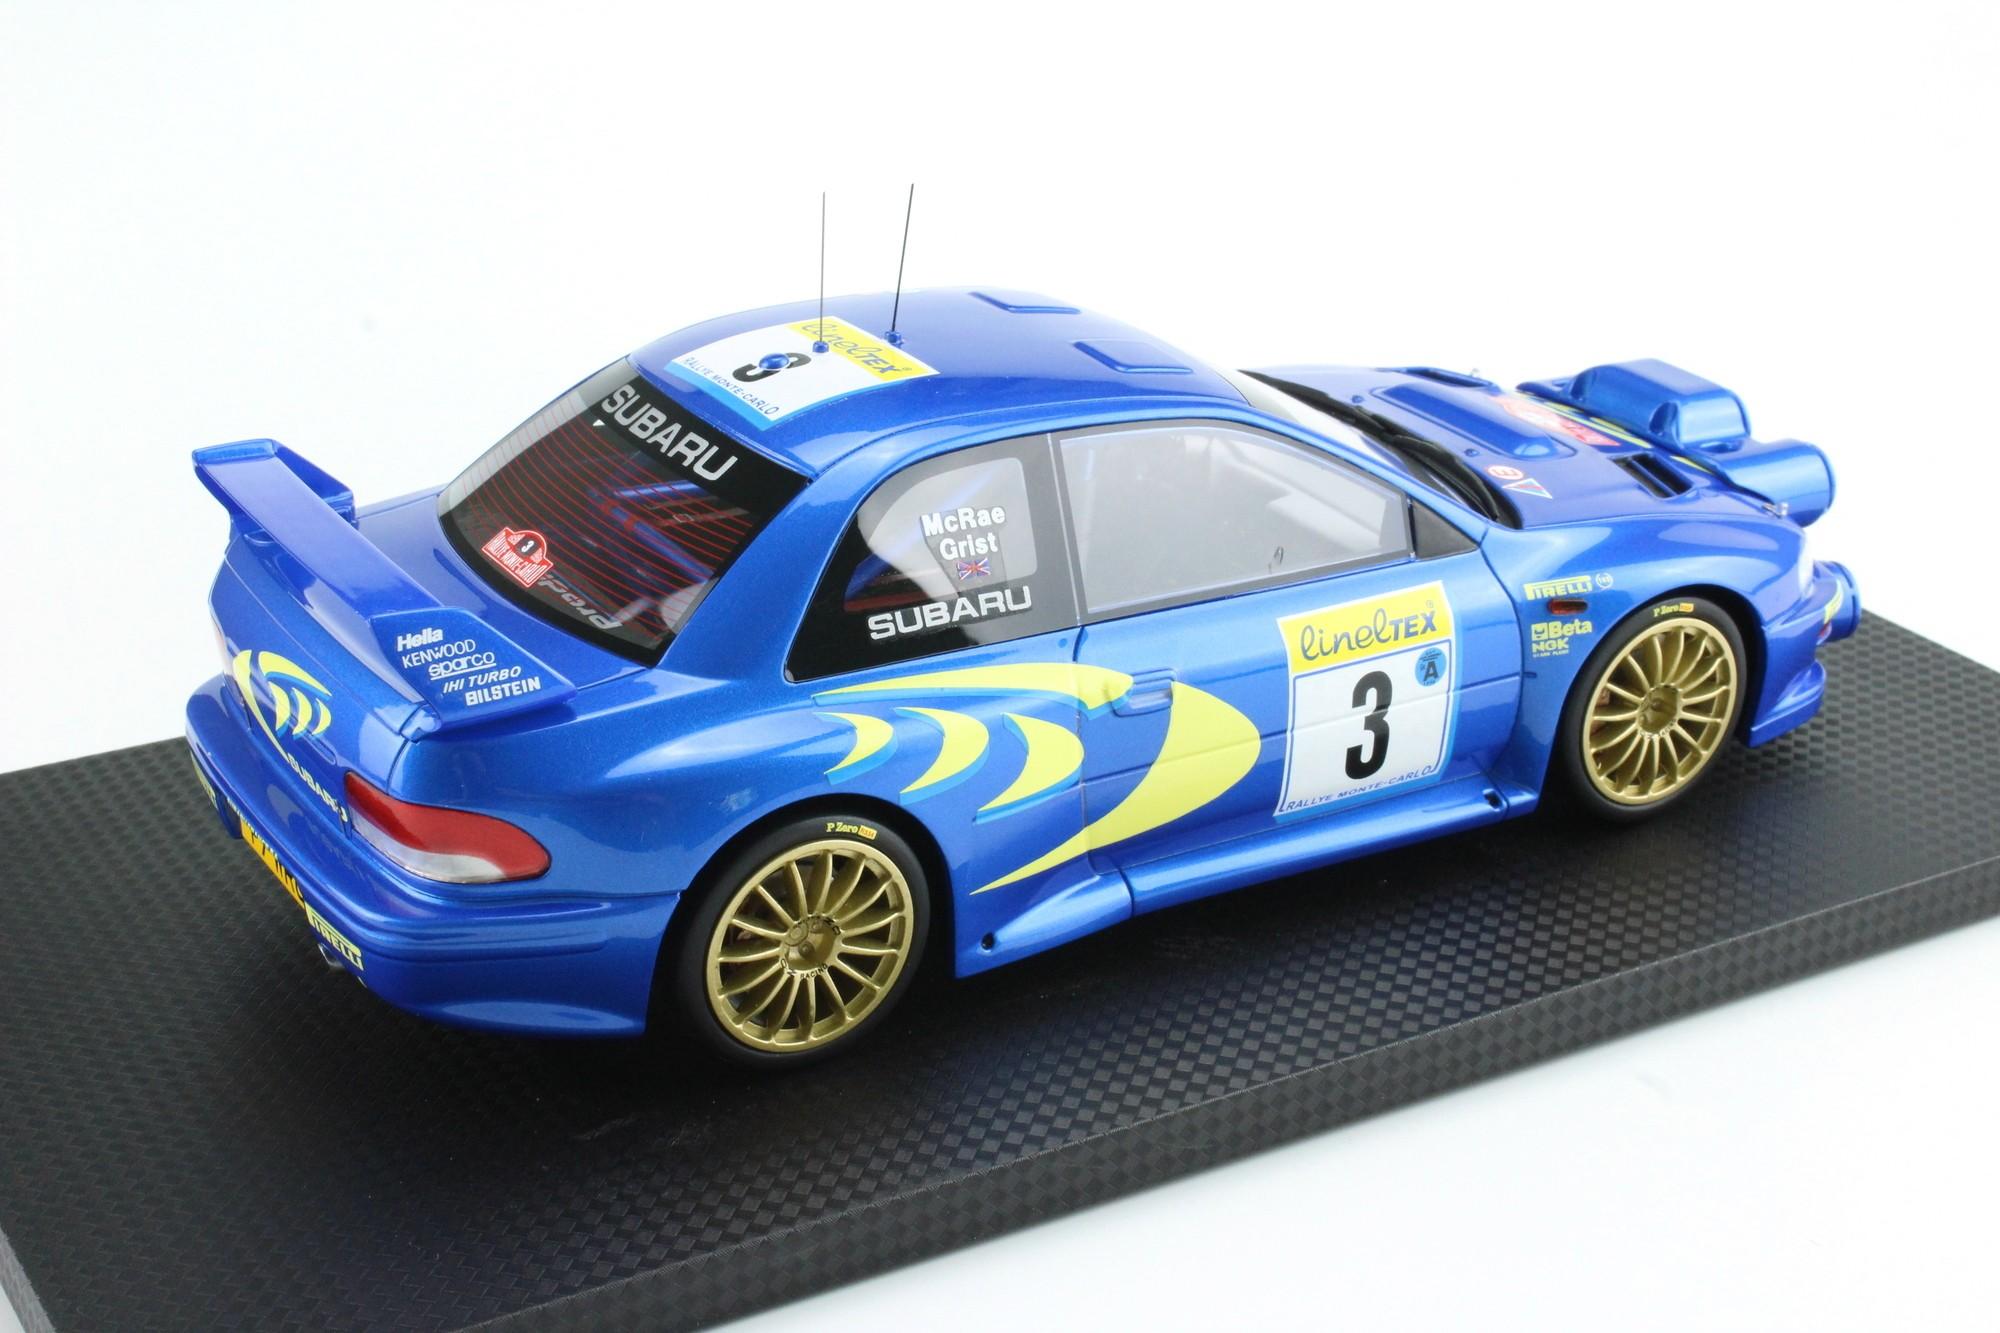 top marques collectibles subaru impreza  wrc mc rally  colin mcrae nicky grist